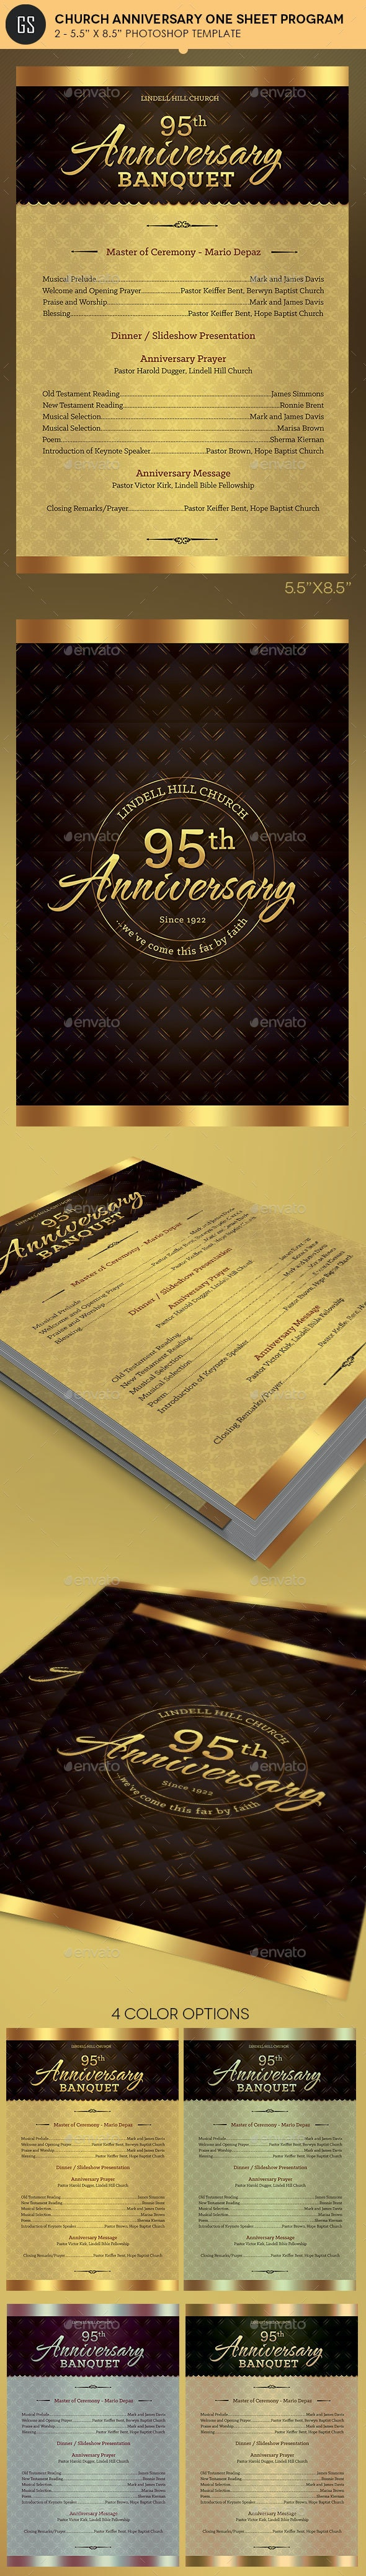 Church Anniversary One Sheet Program Template - Informational Brochures